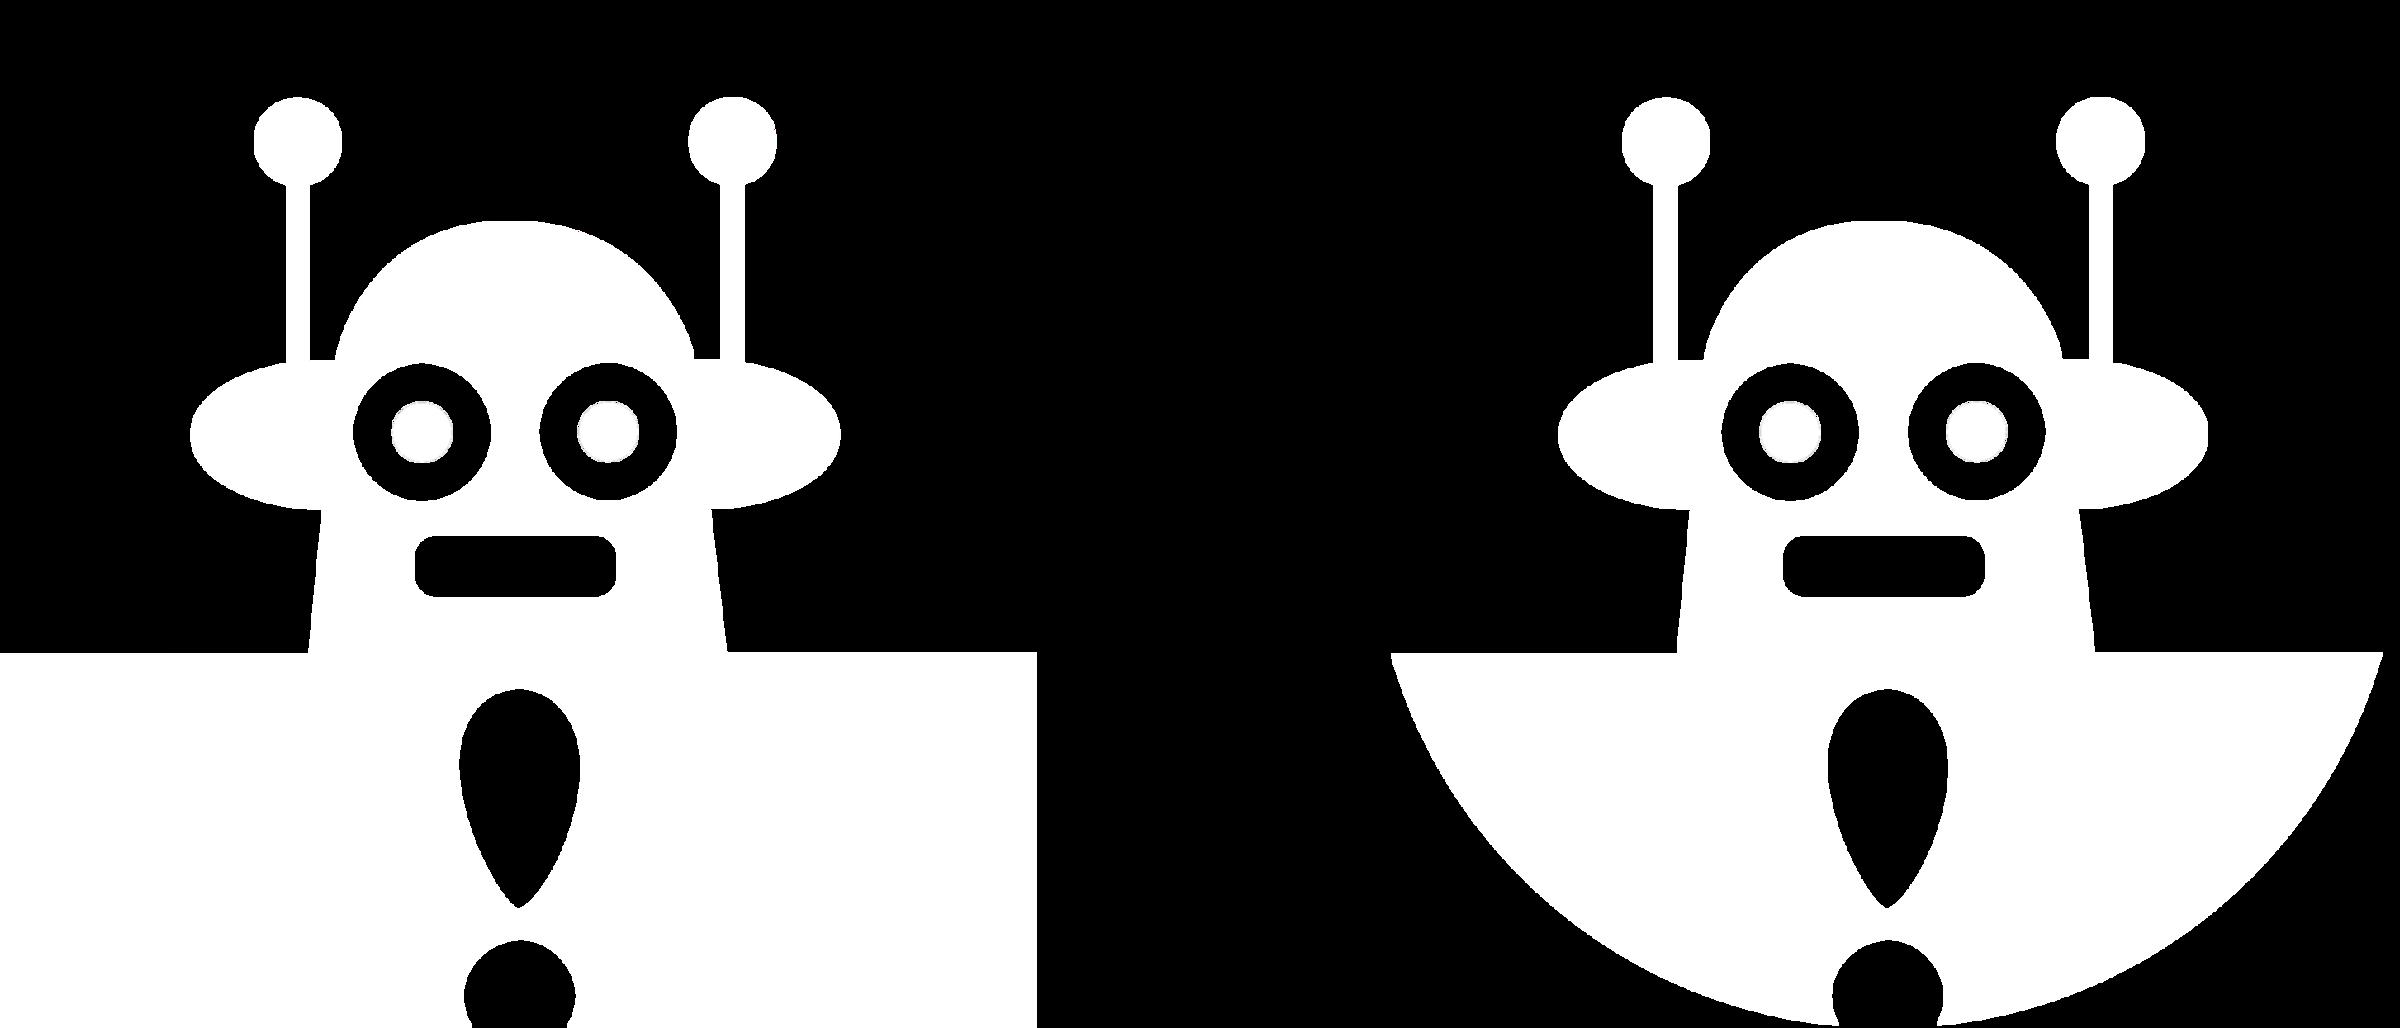 Logoshirt Logo